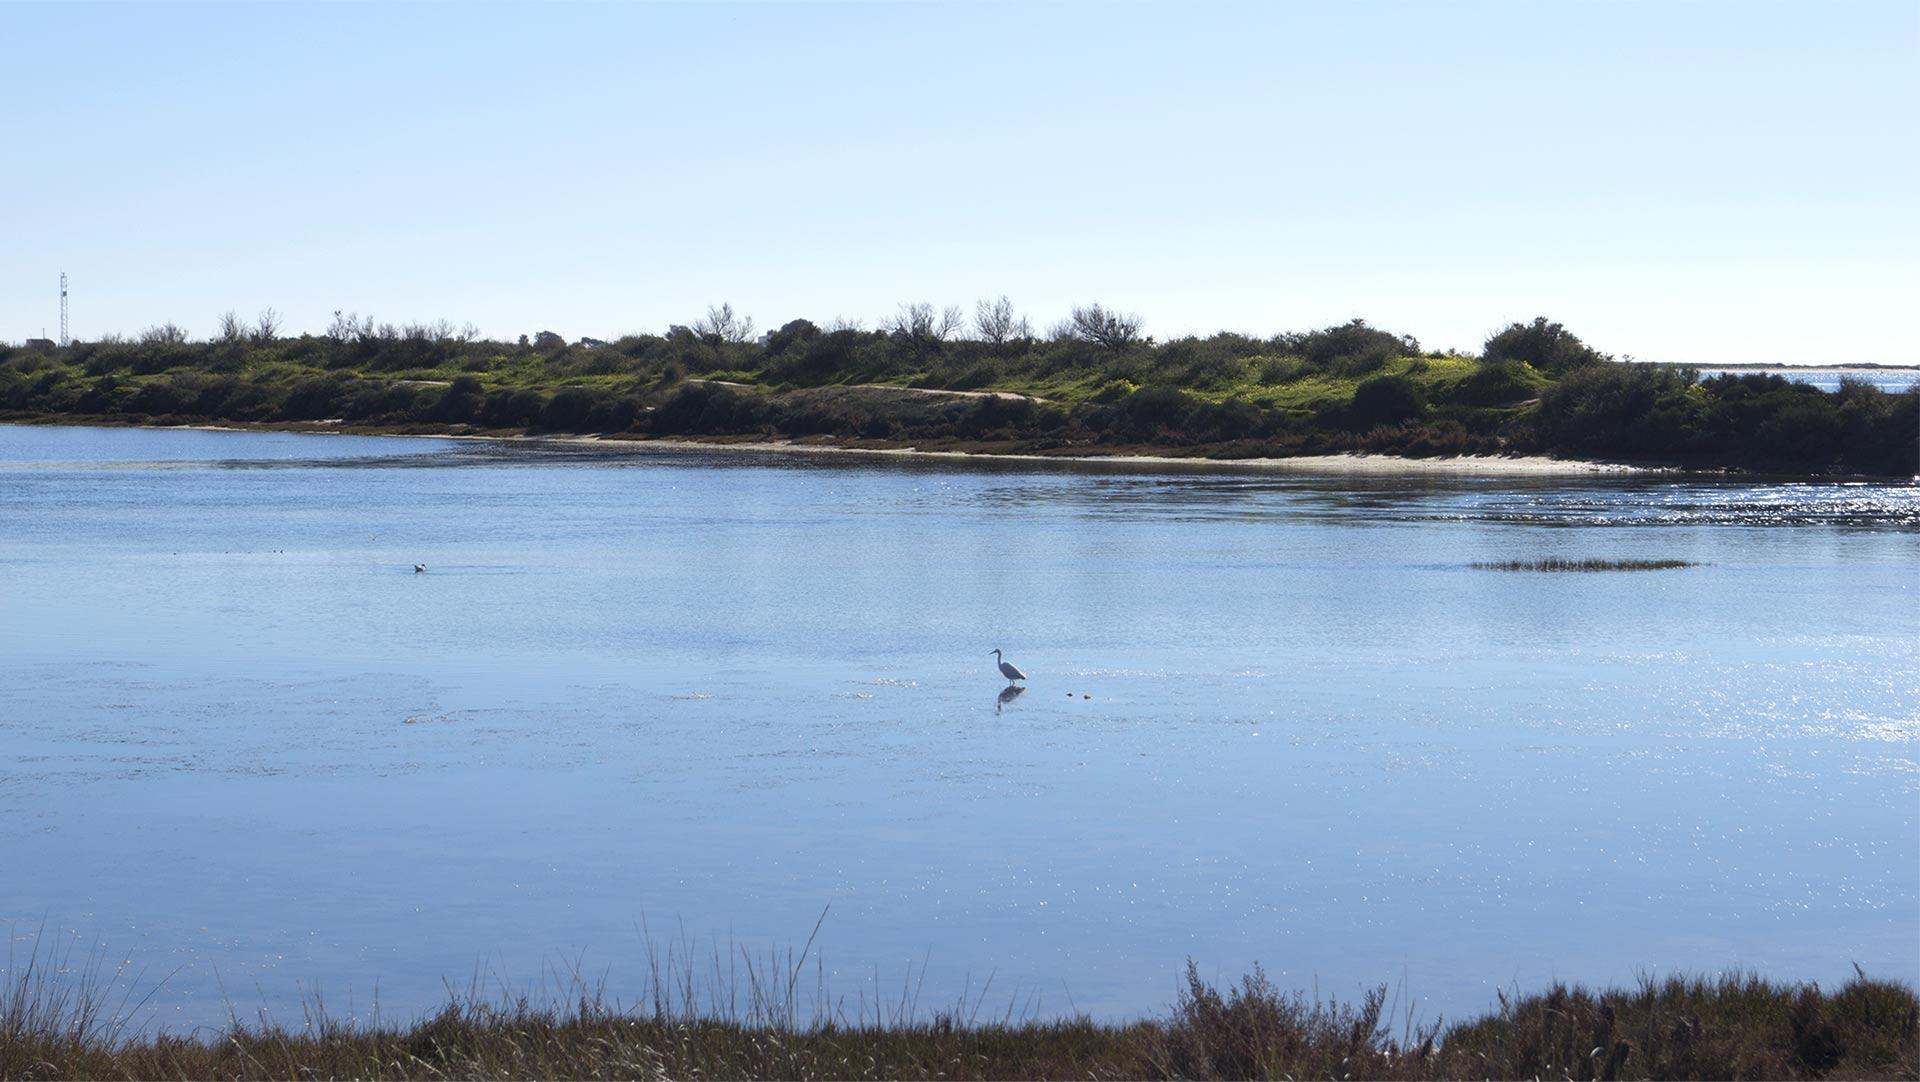 vacanza in algarve all'insegna del birdwatching al ria formosa natural park